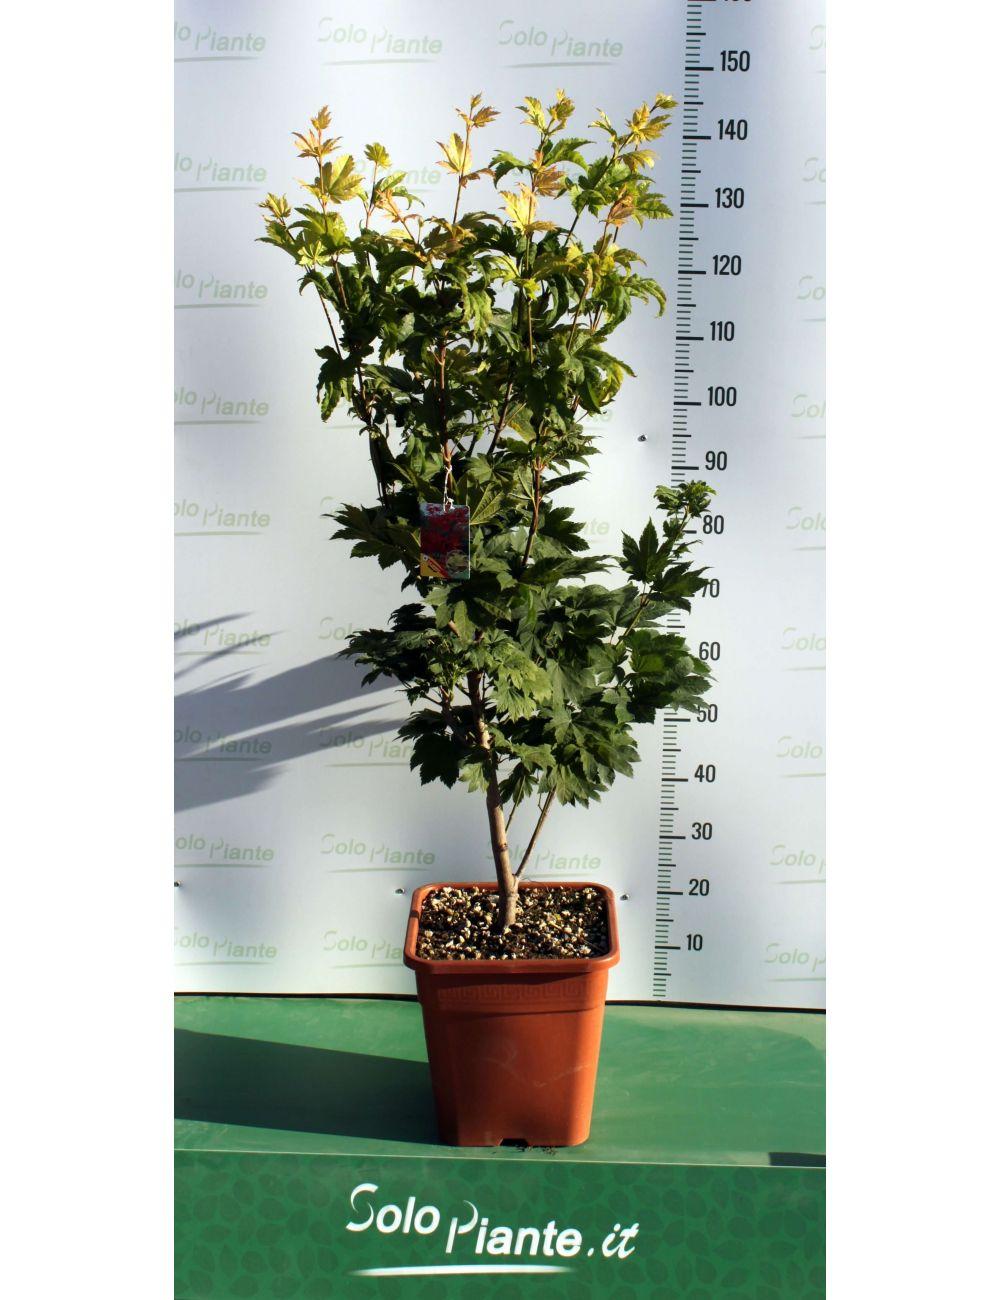 Acero giapponese vitifolium vaso 28 30 cm vendita for Acero giapponese in vaso